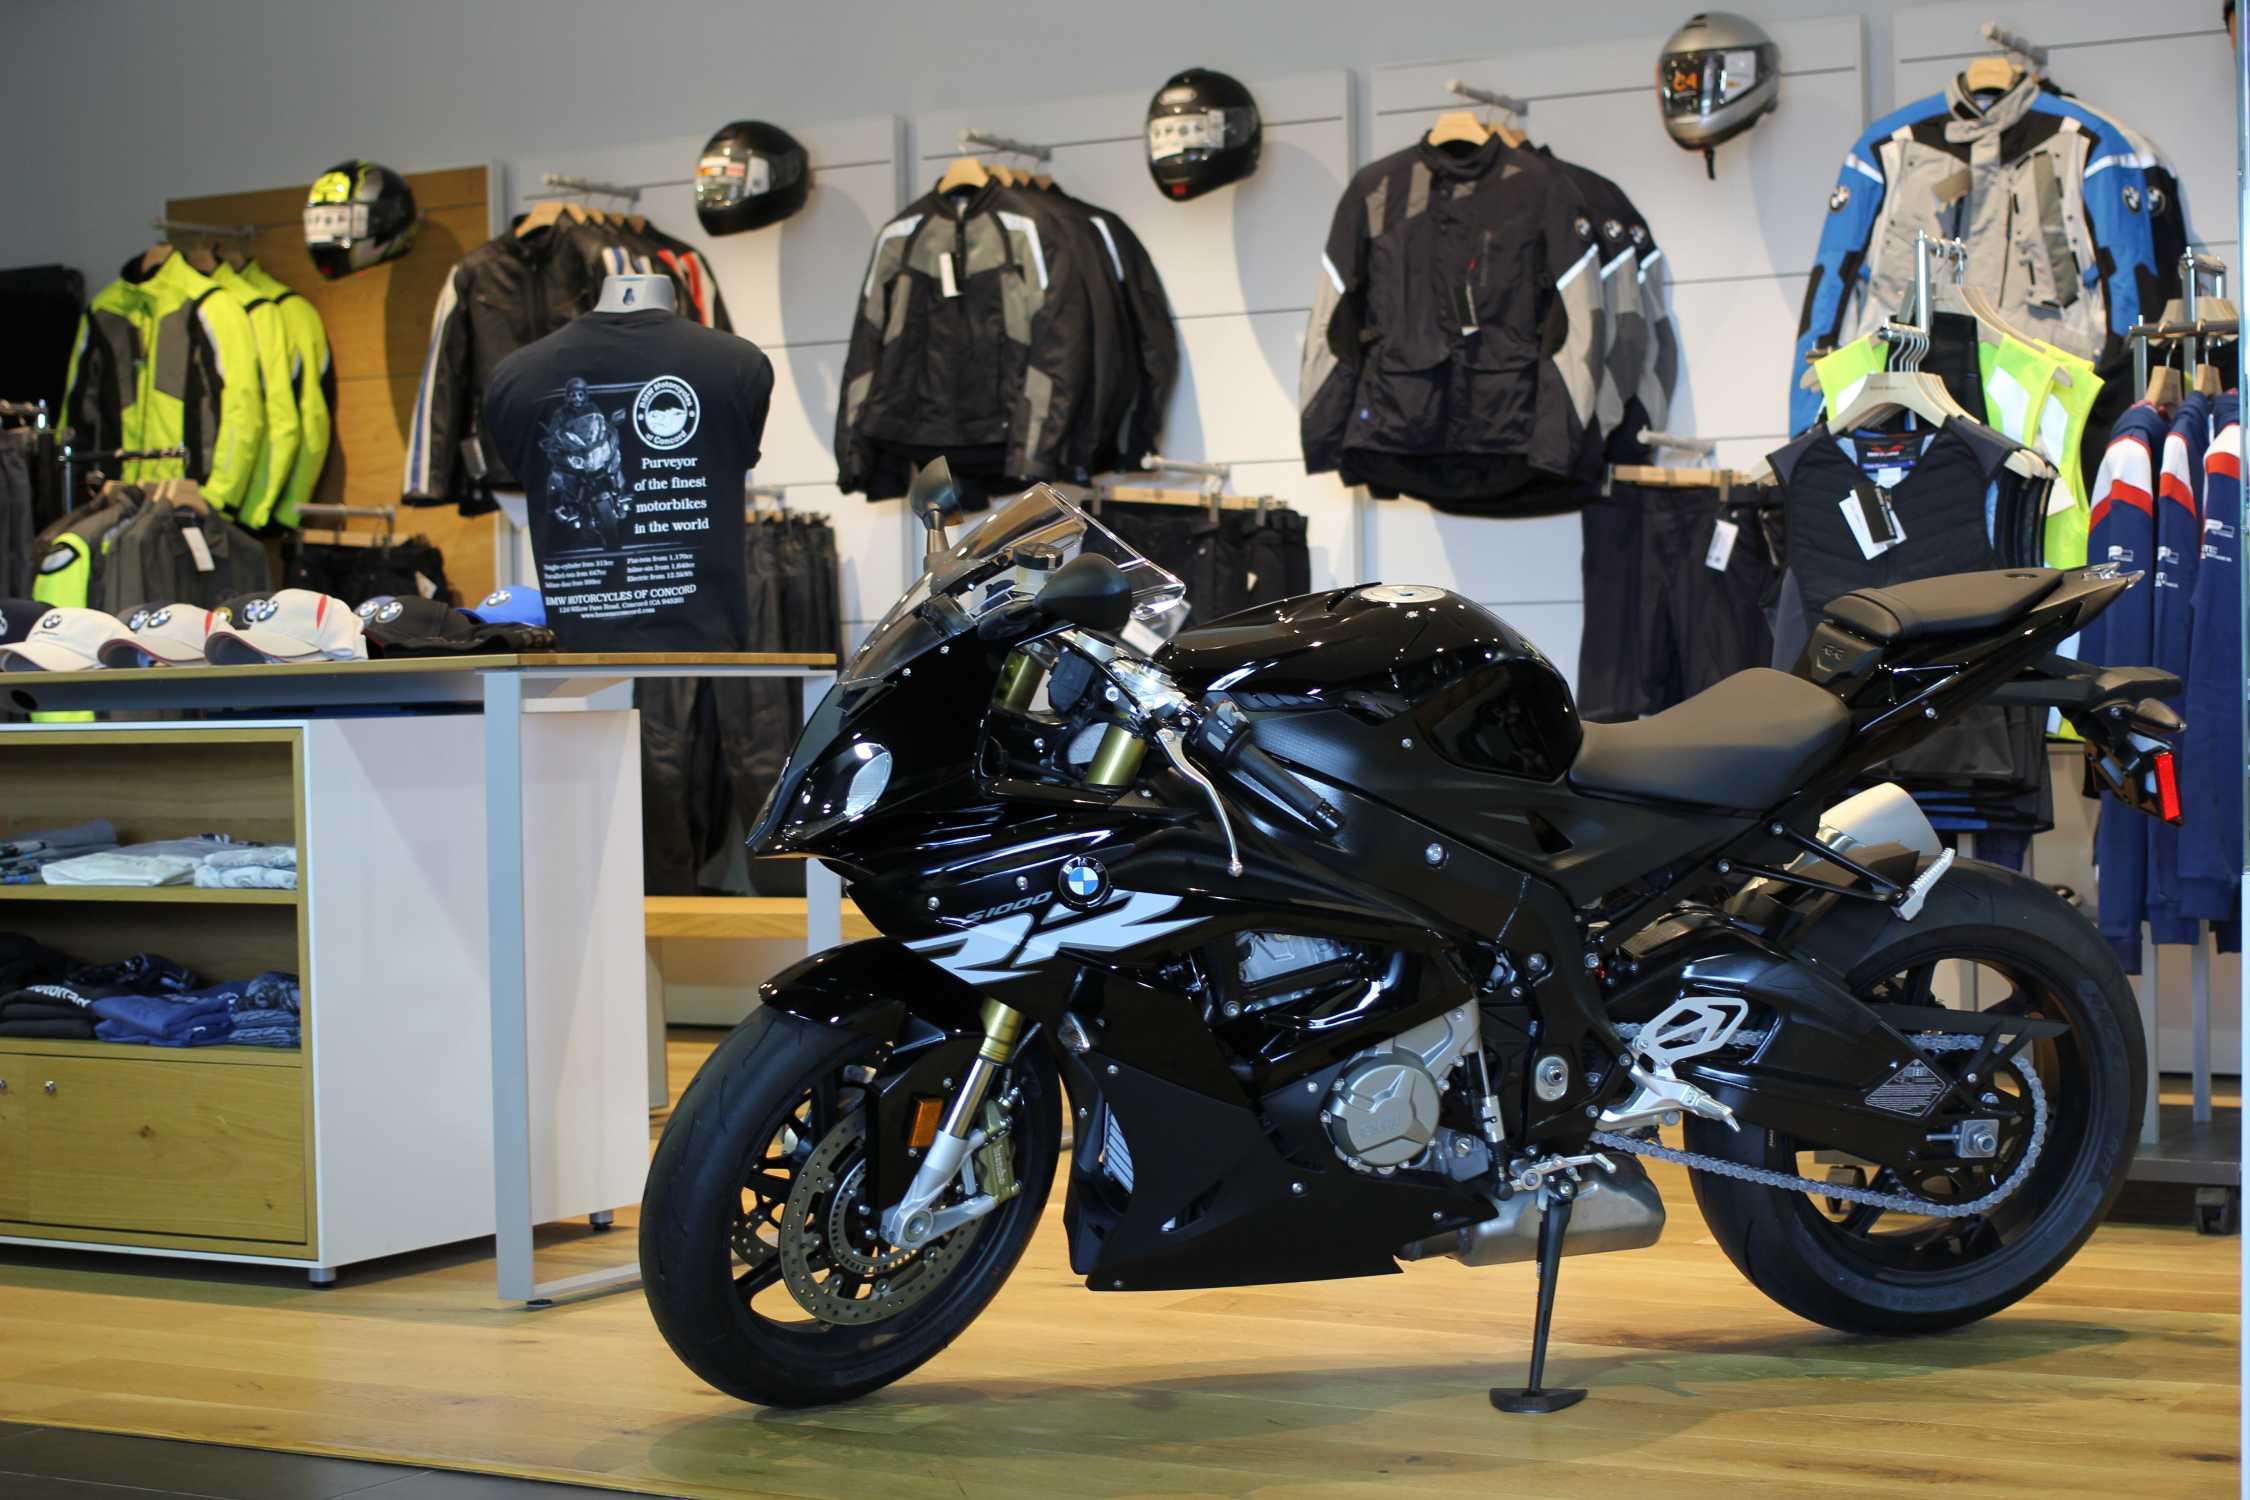 Bmw Dealer Near Me >> Bmw Motorbike Dealers Near Me